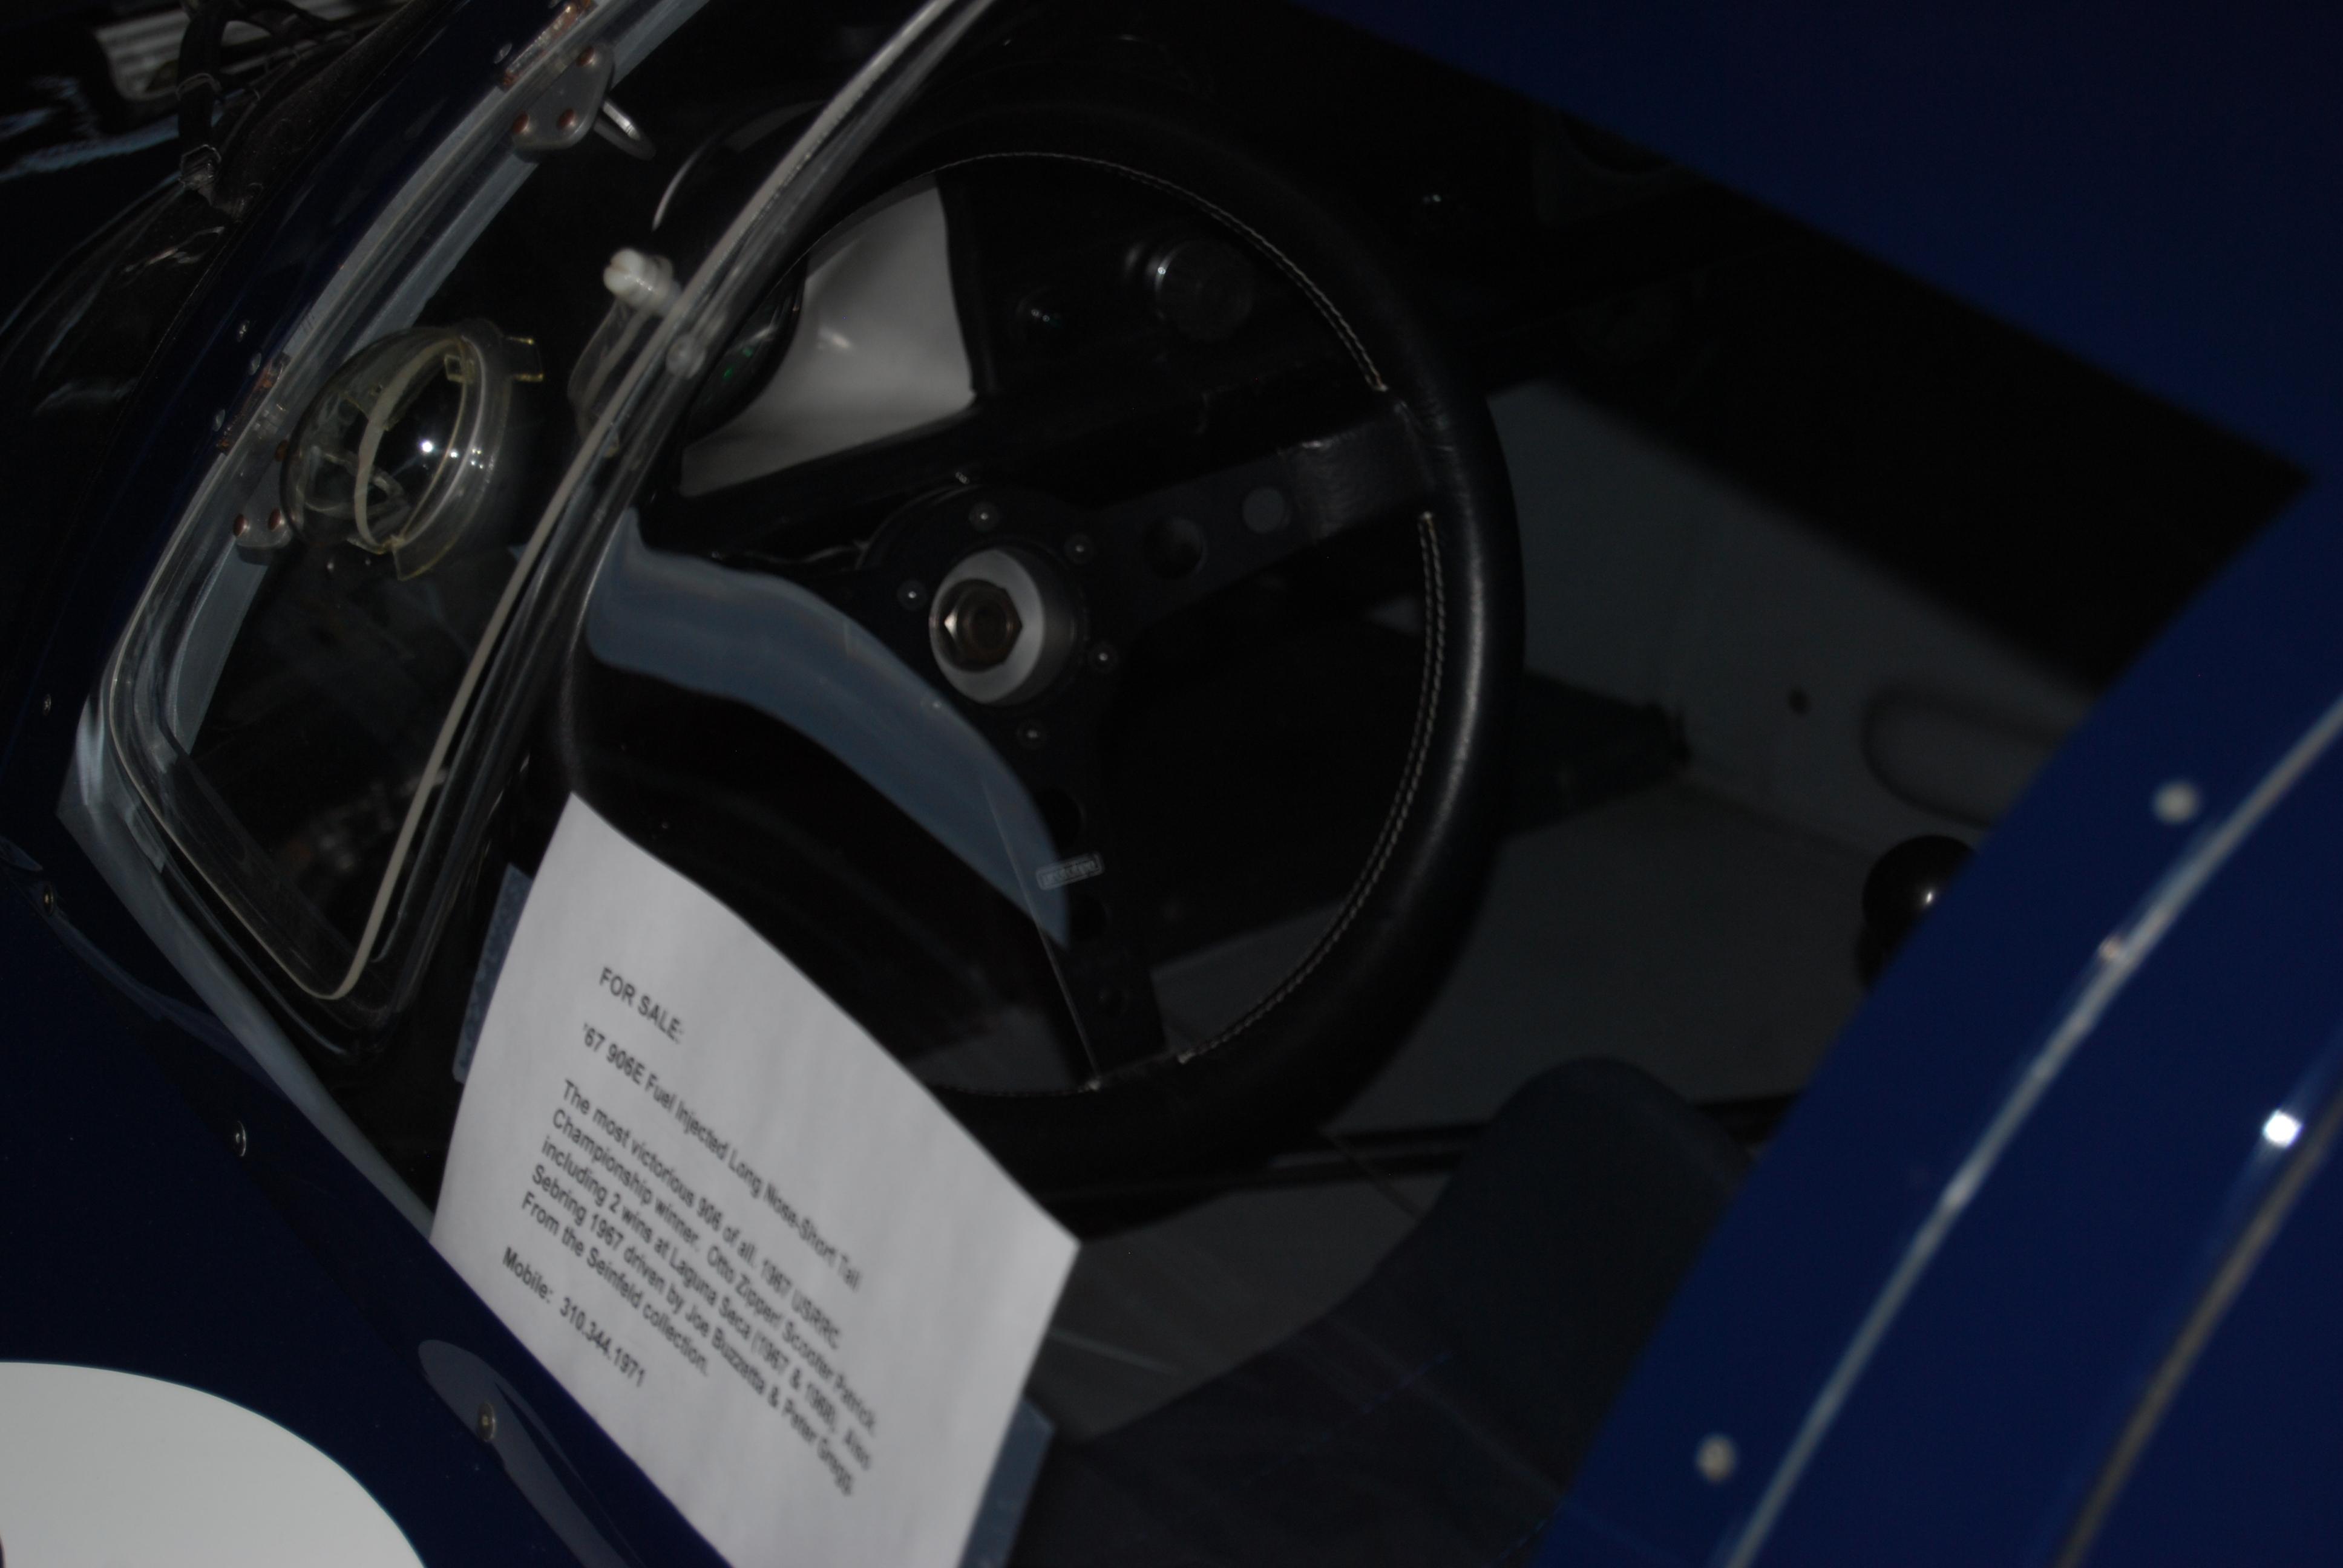 File:Porsche 906 Cockpit, tachometer, steering wheel, for